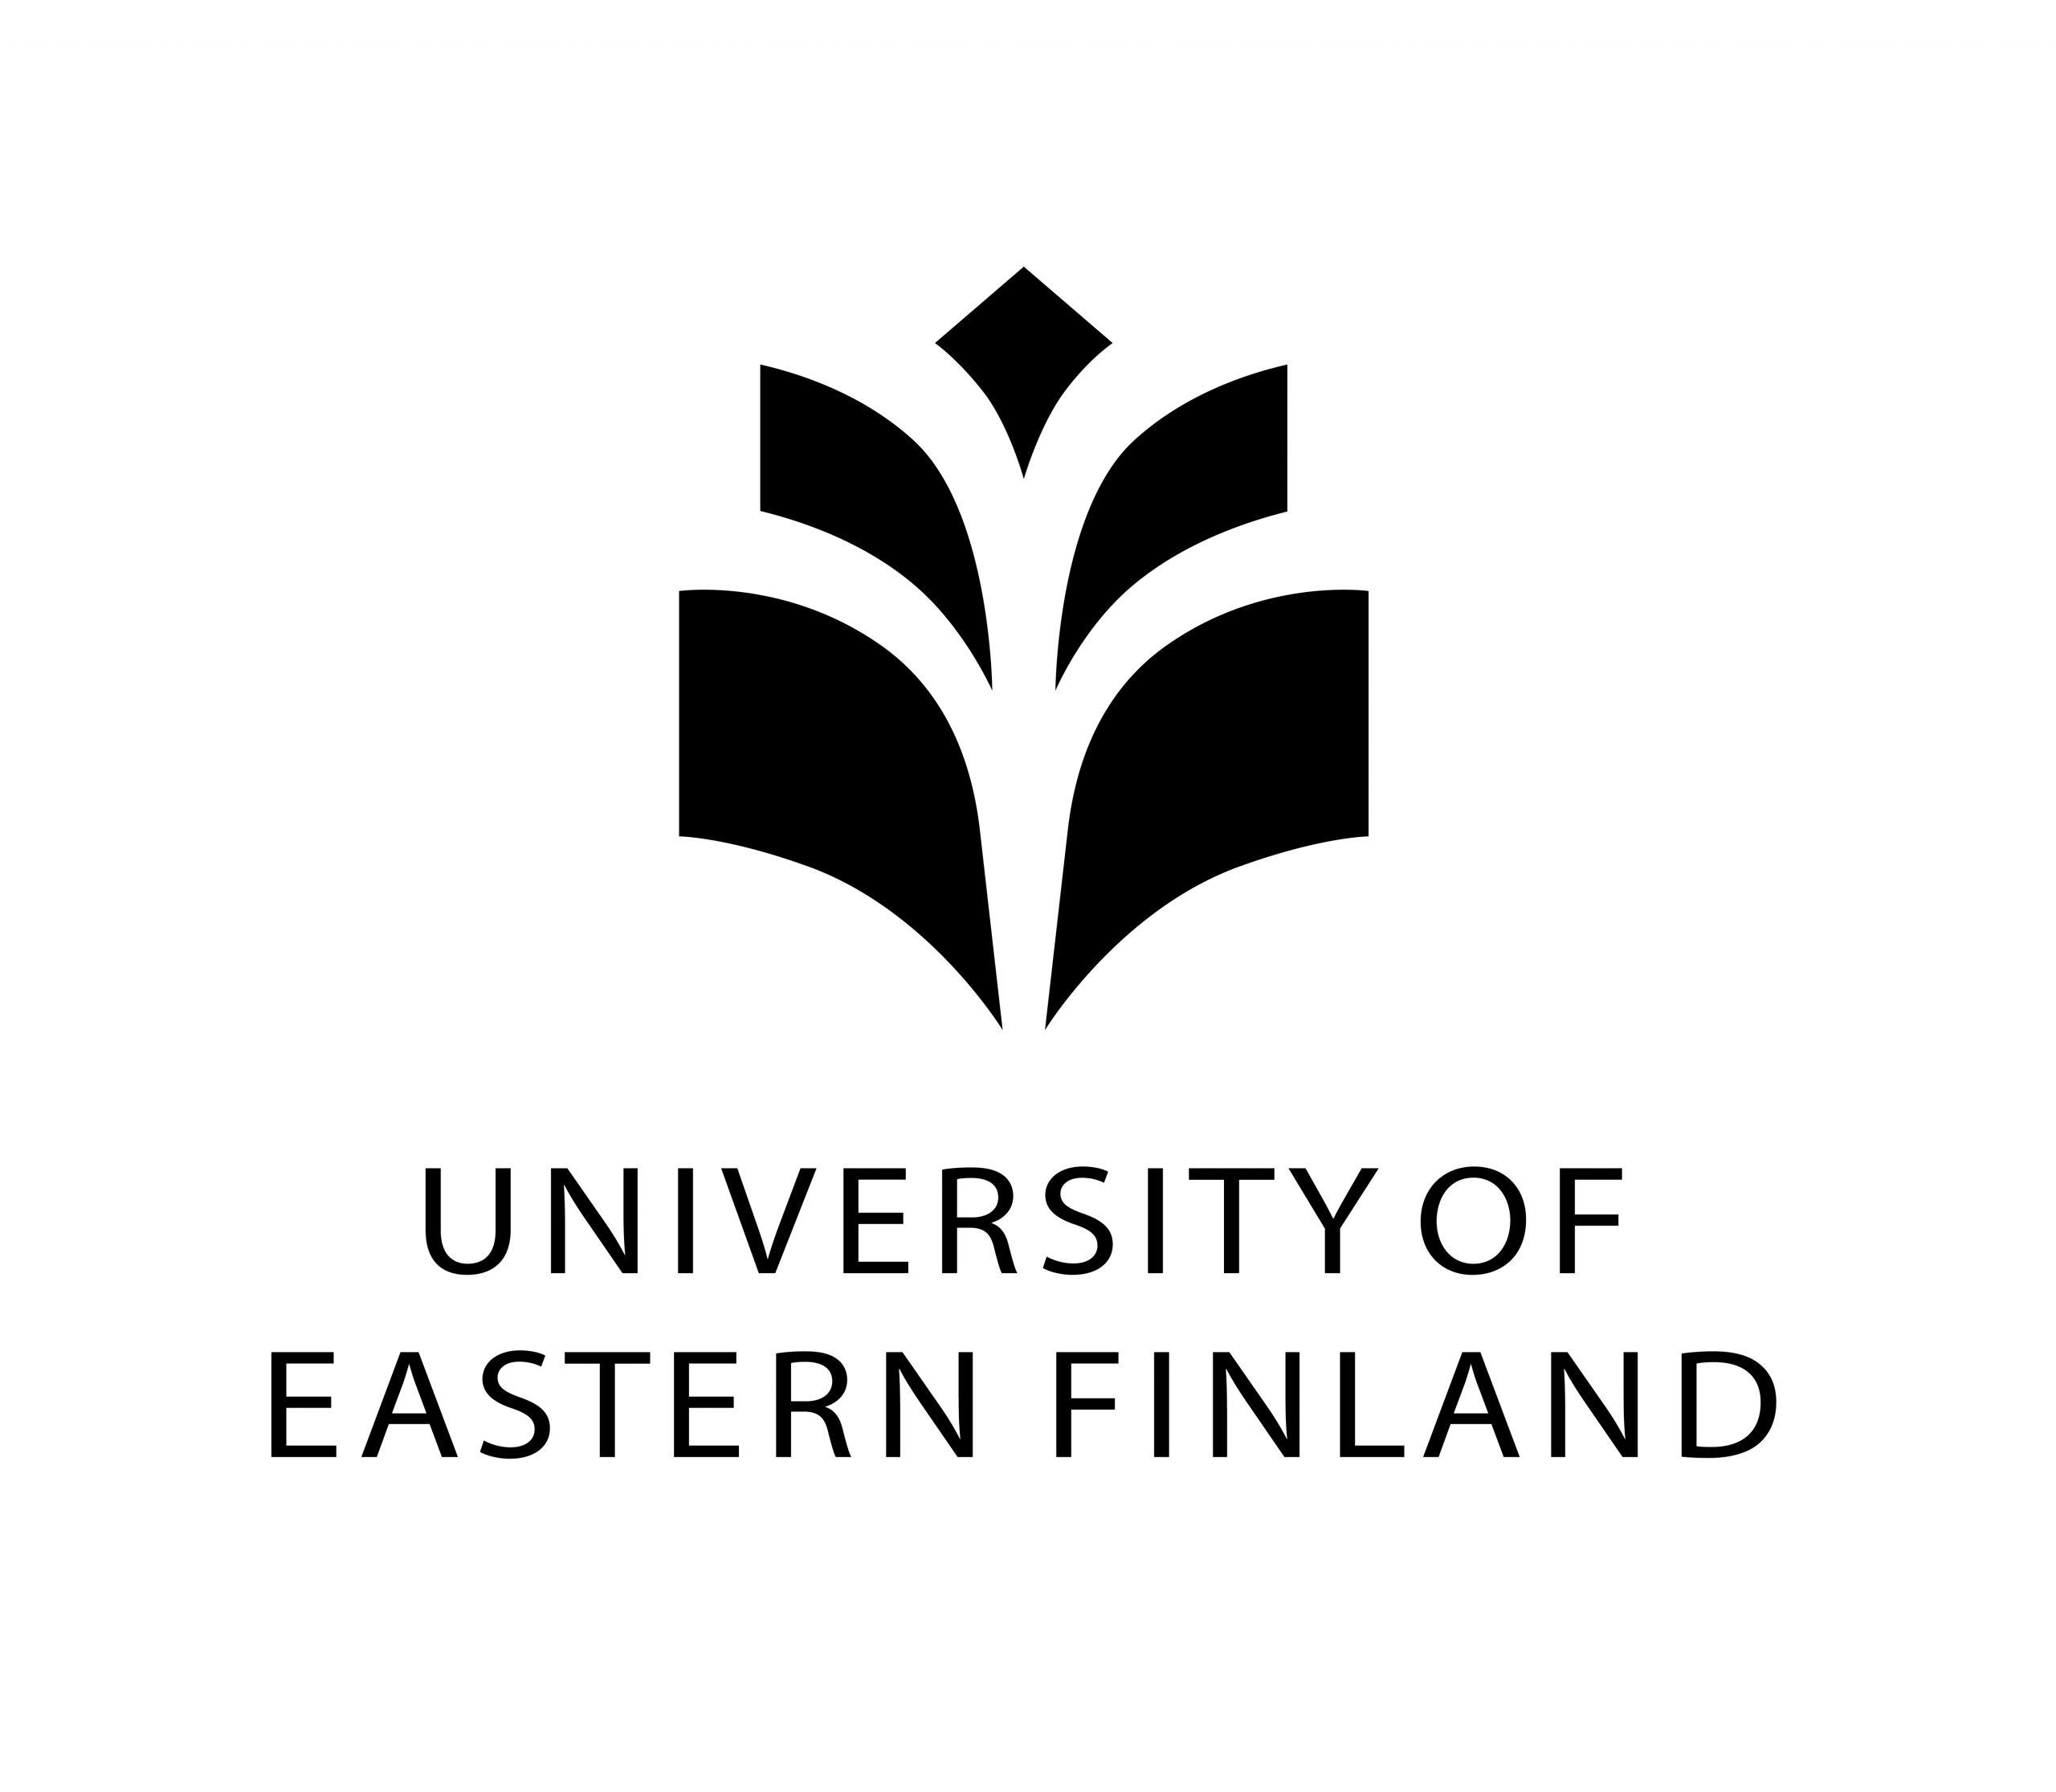 University of Eastern Finland